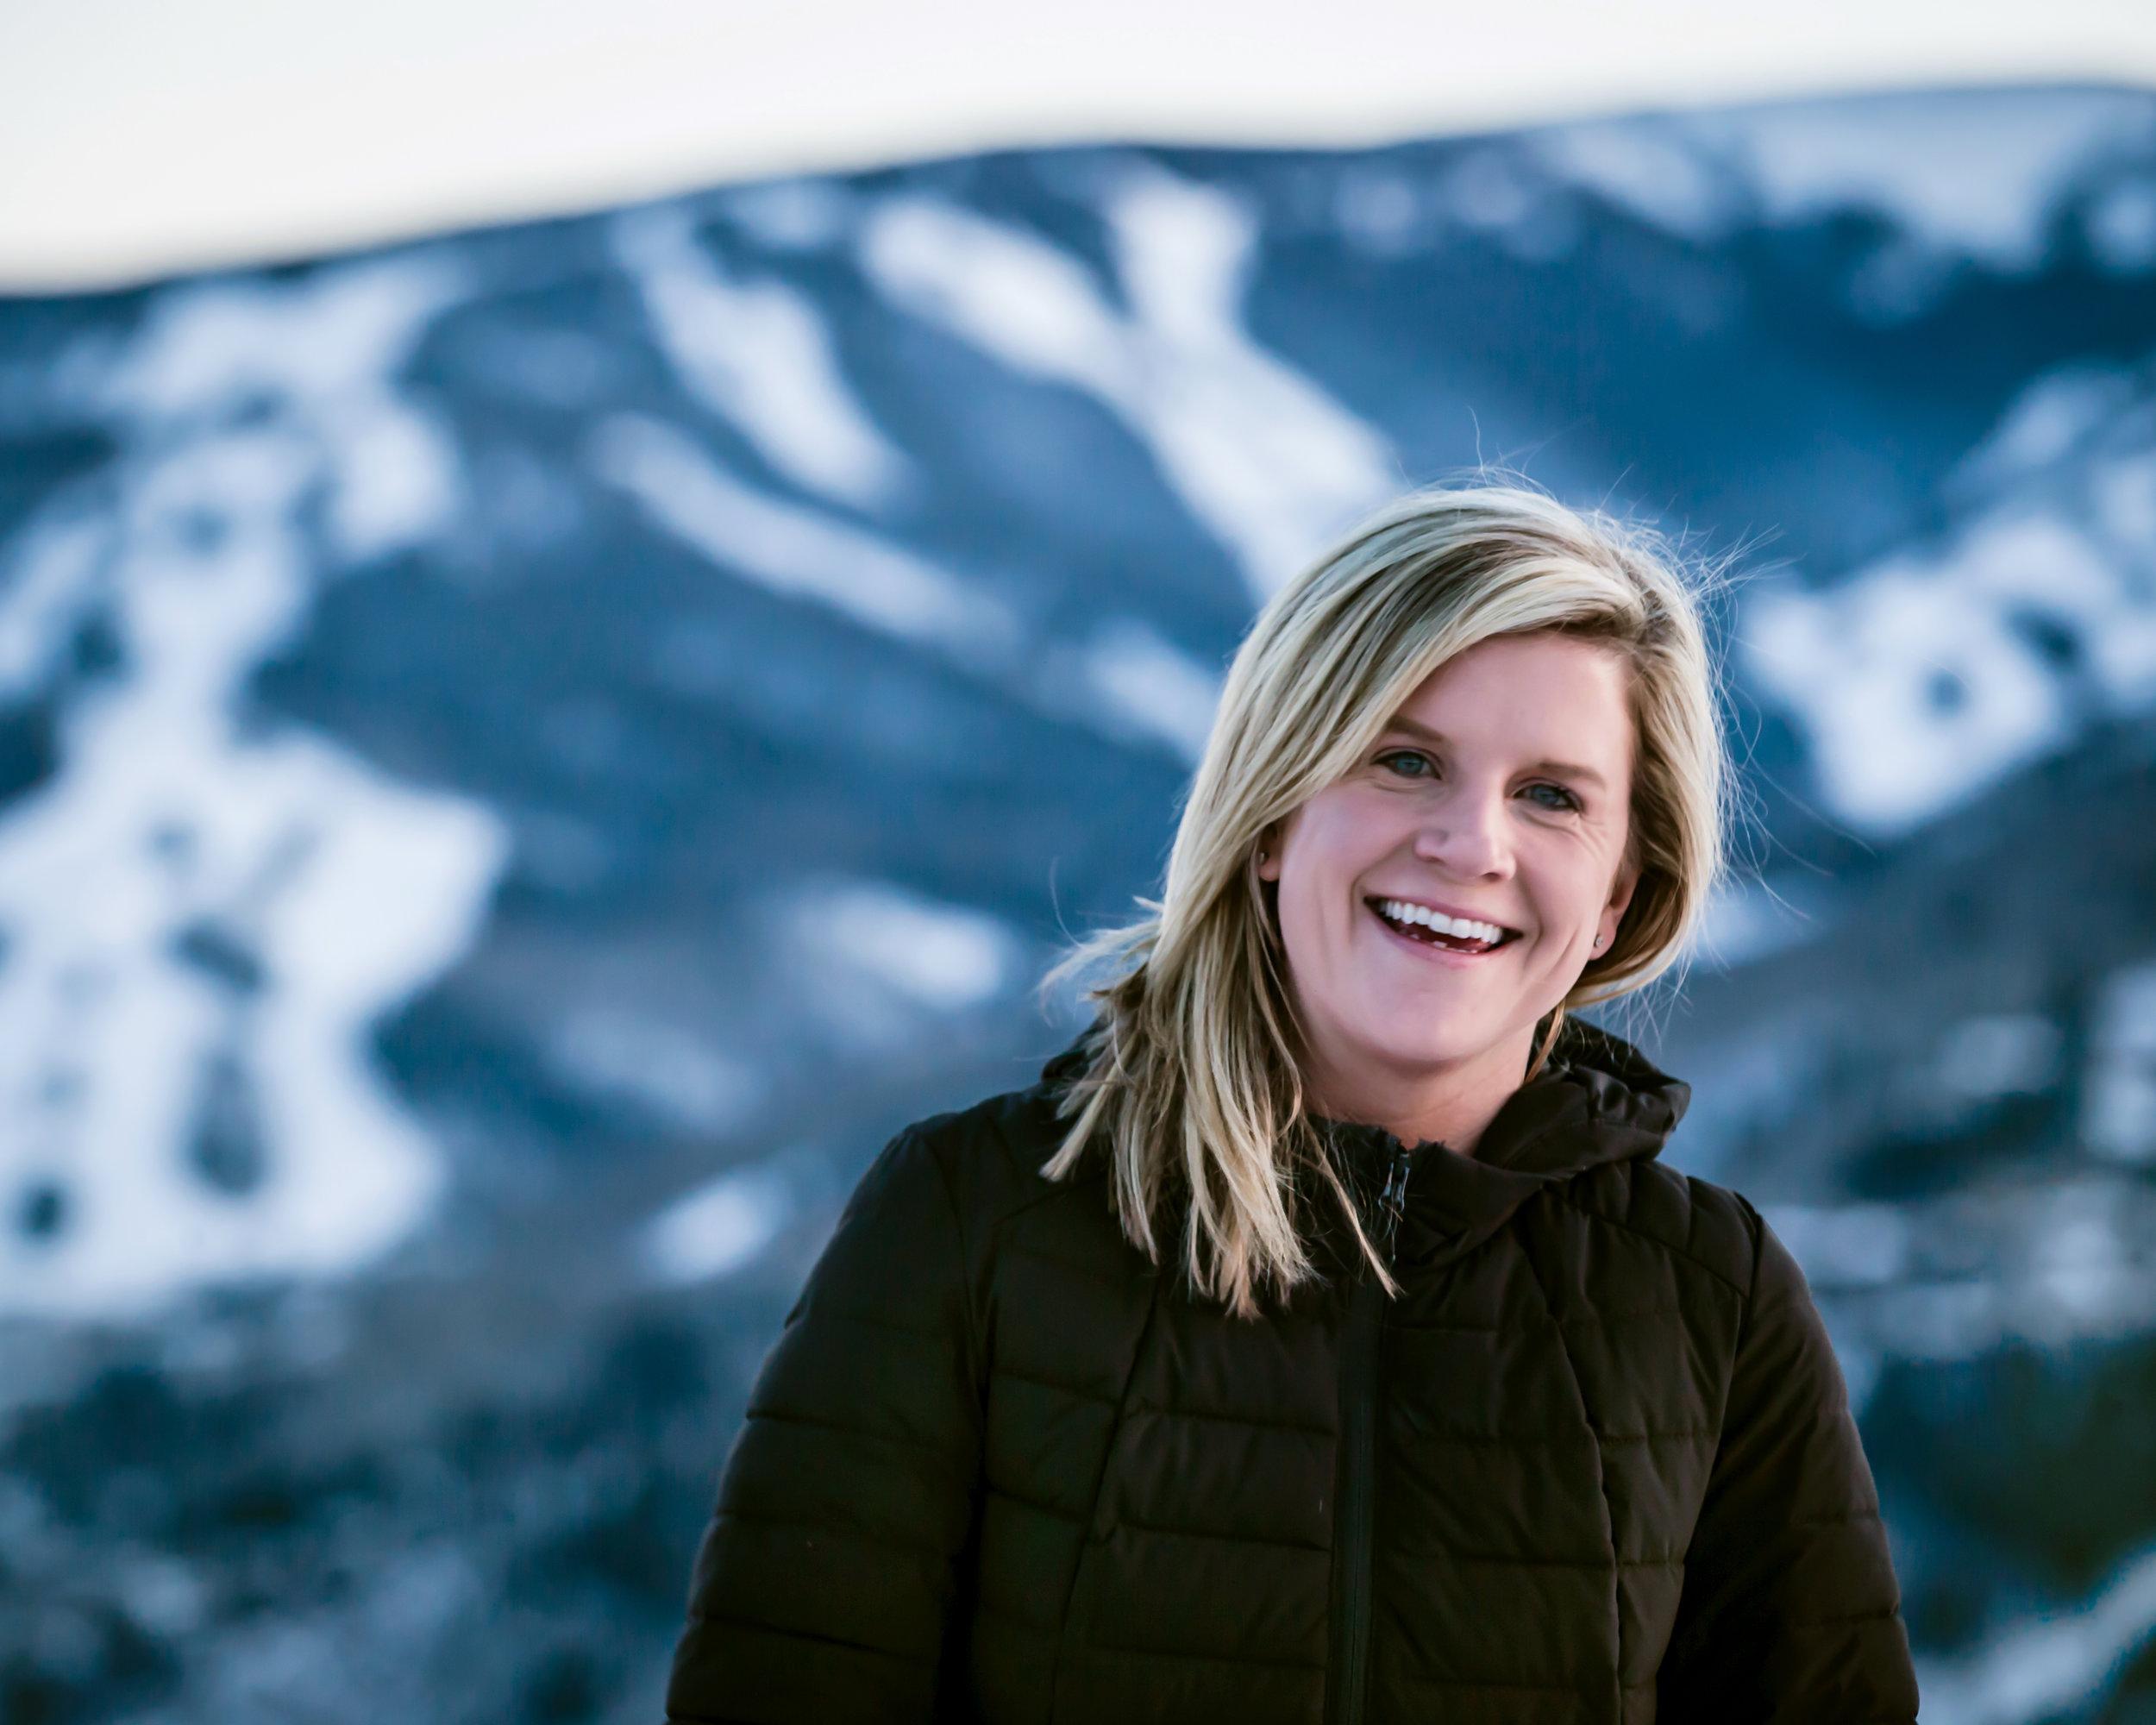 Jill coyle , VICE PRESIDENT, hill aevium